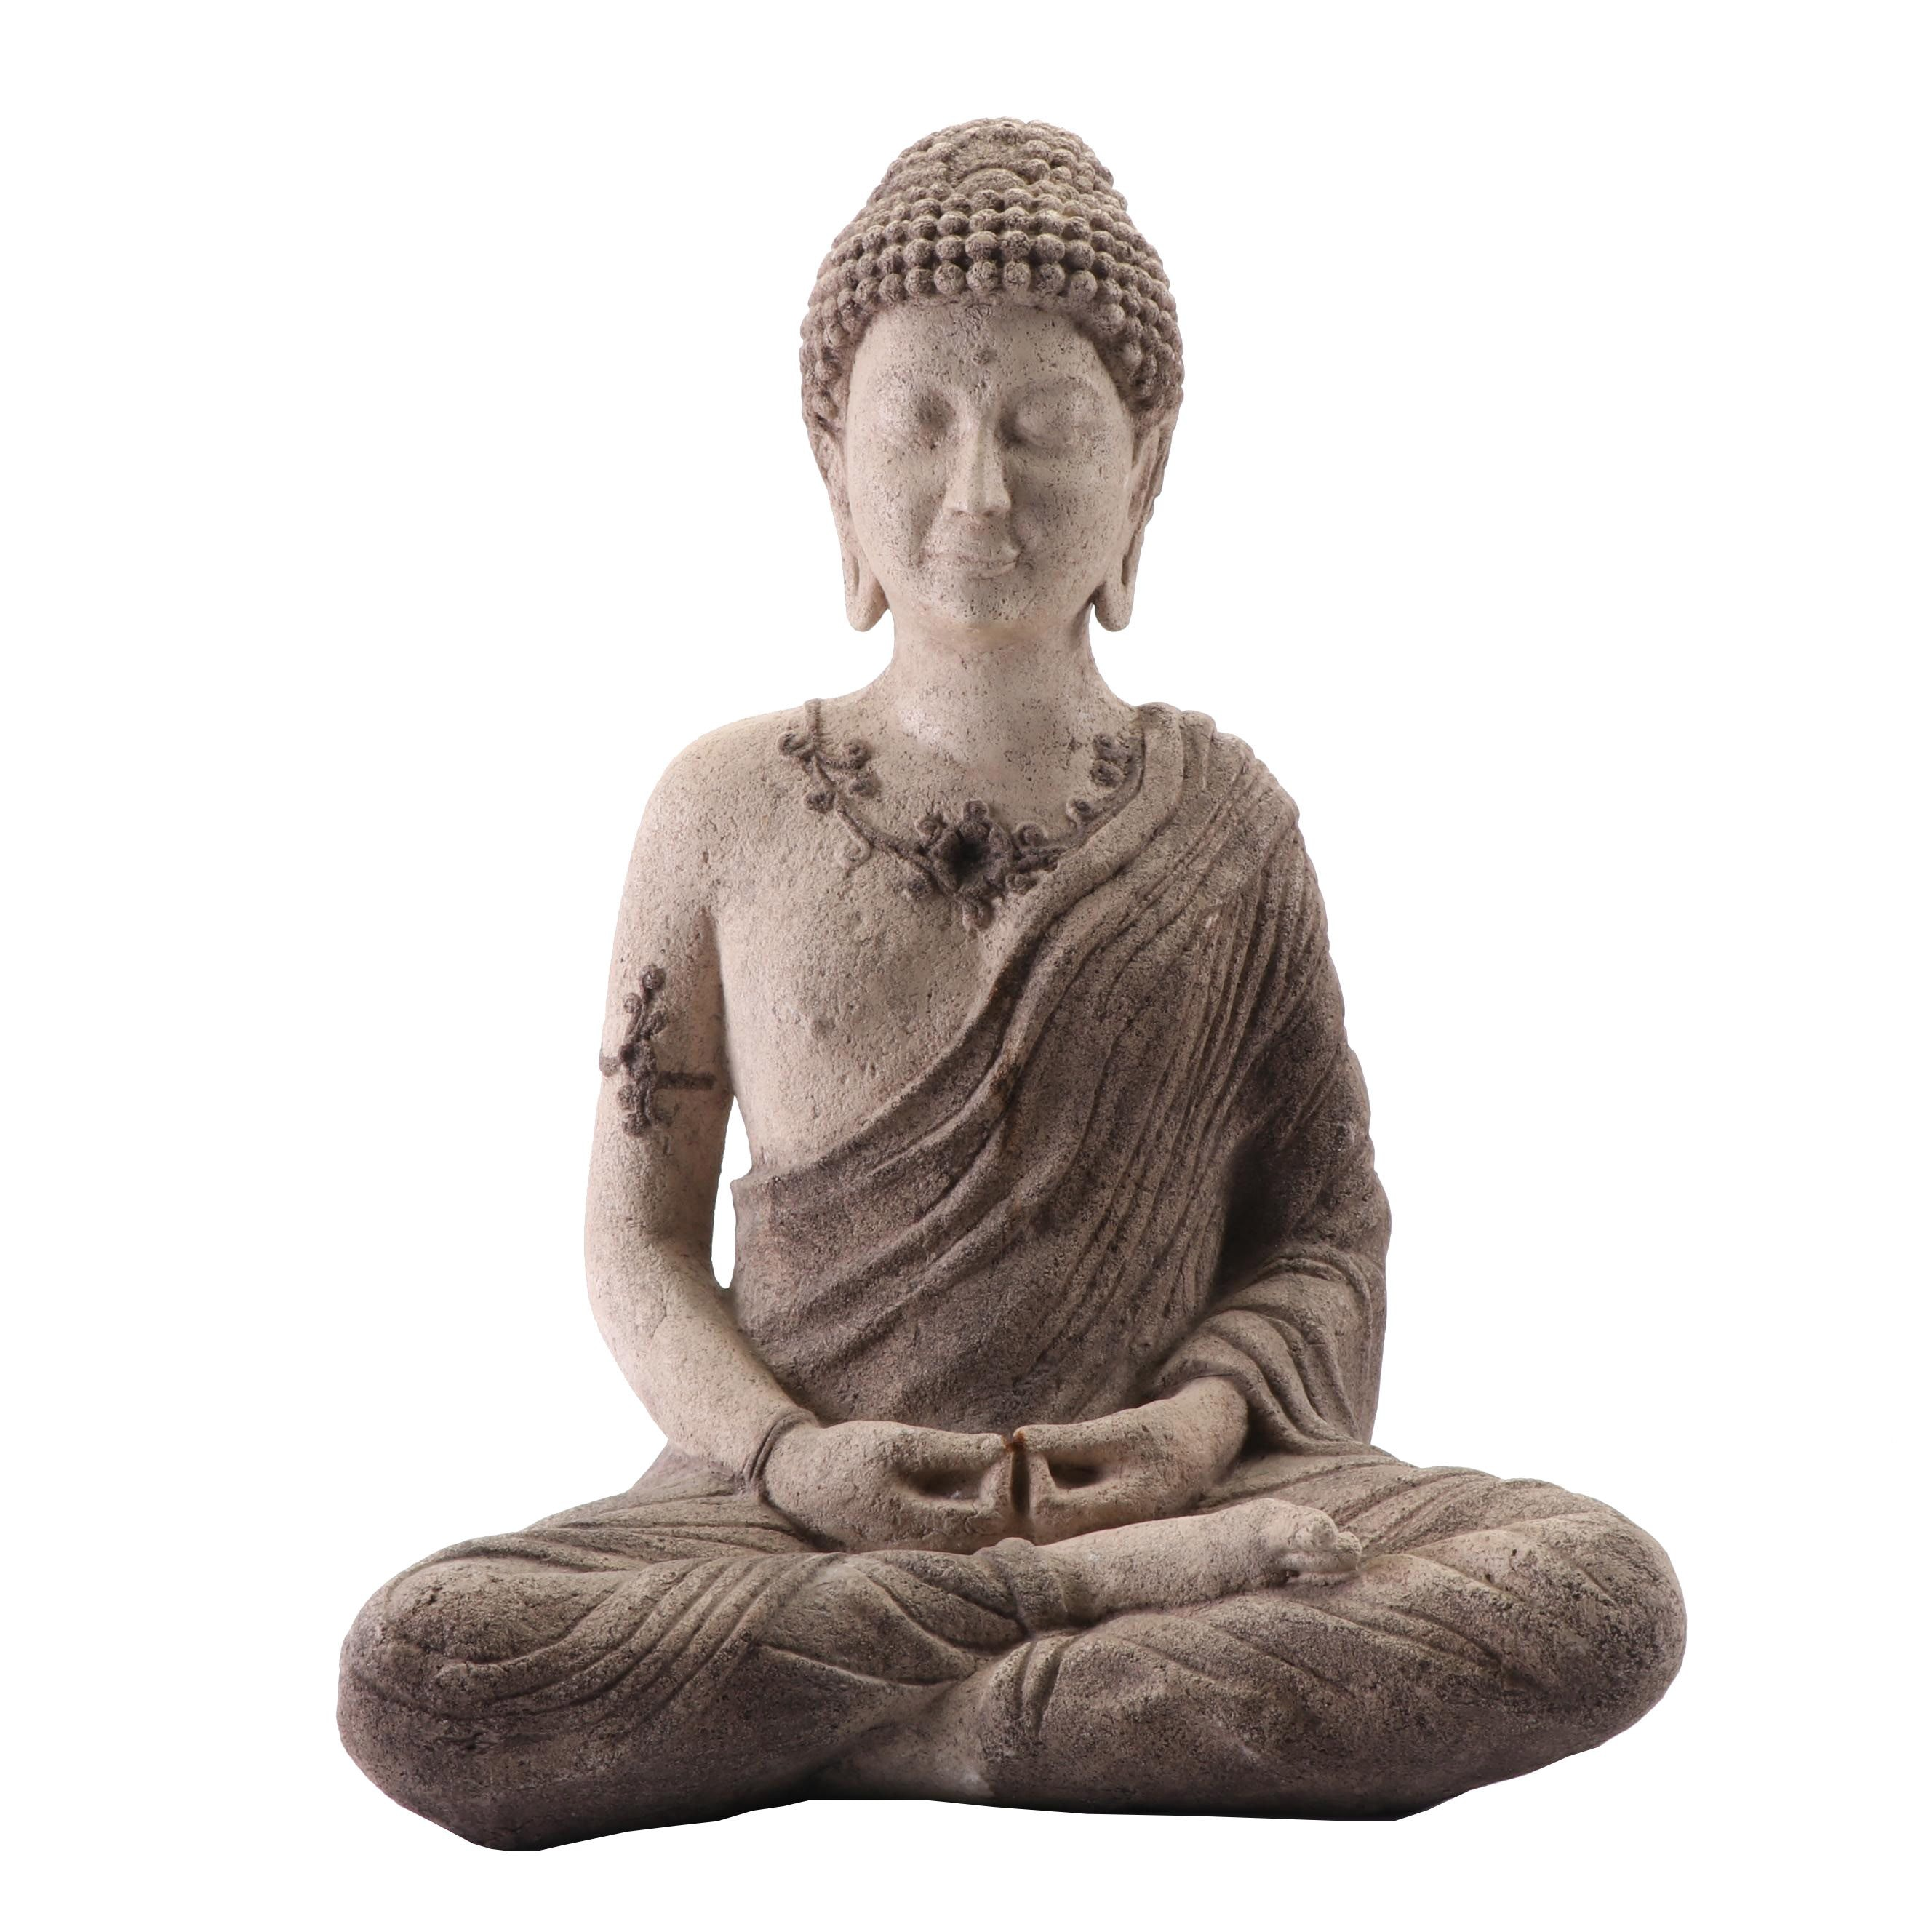 Seated Buddha Cast Plaster Sculpture